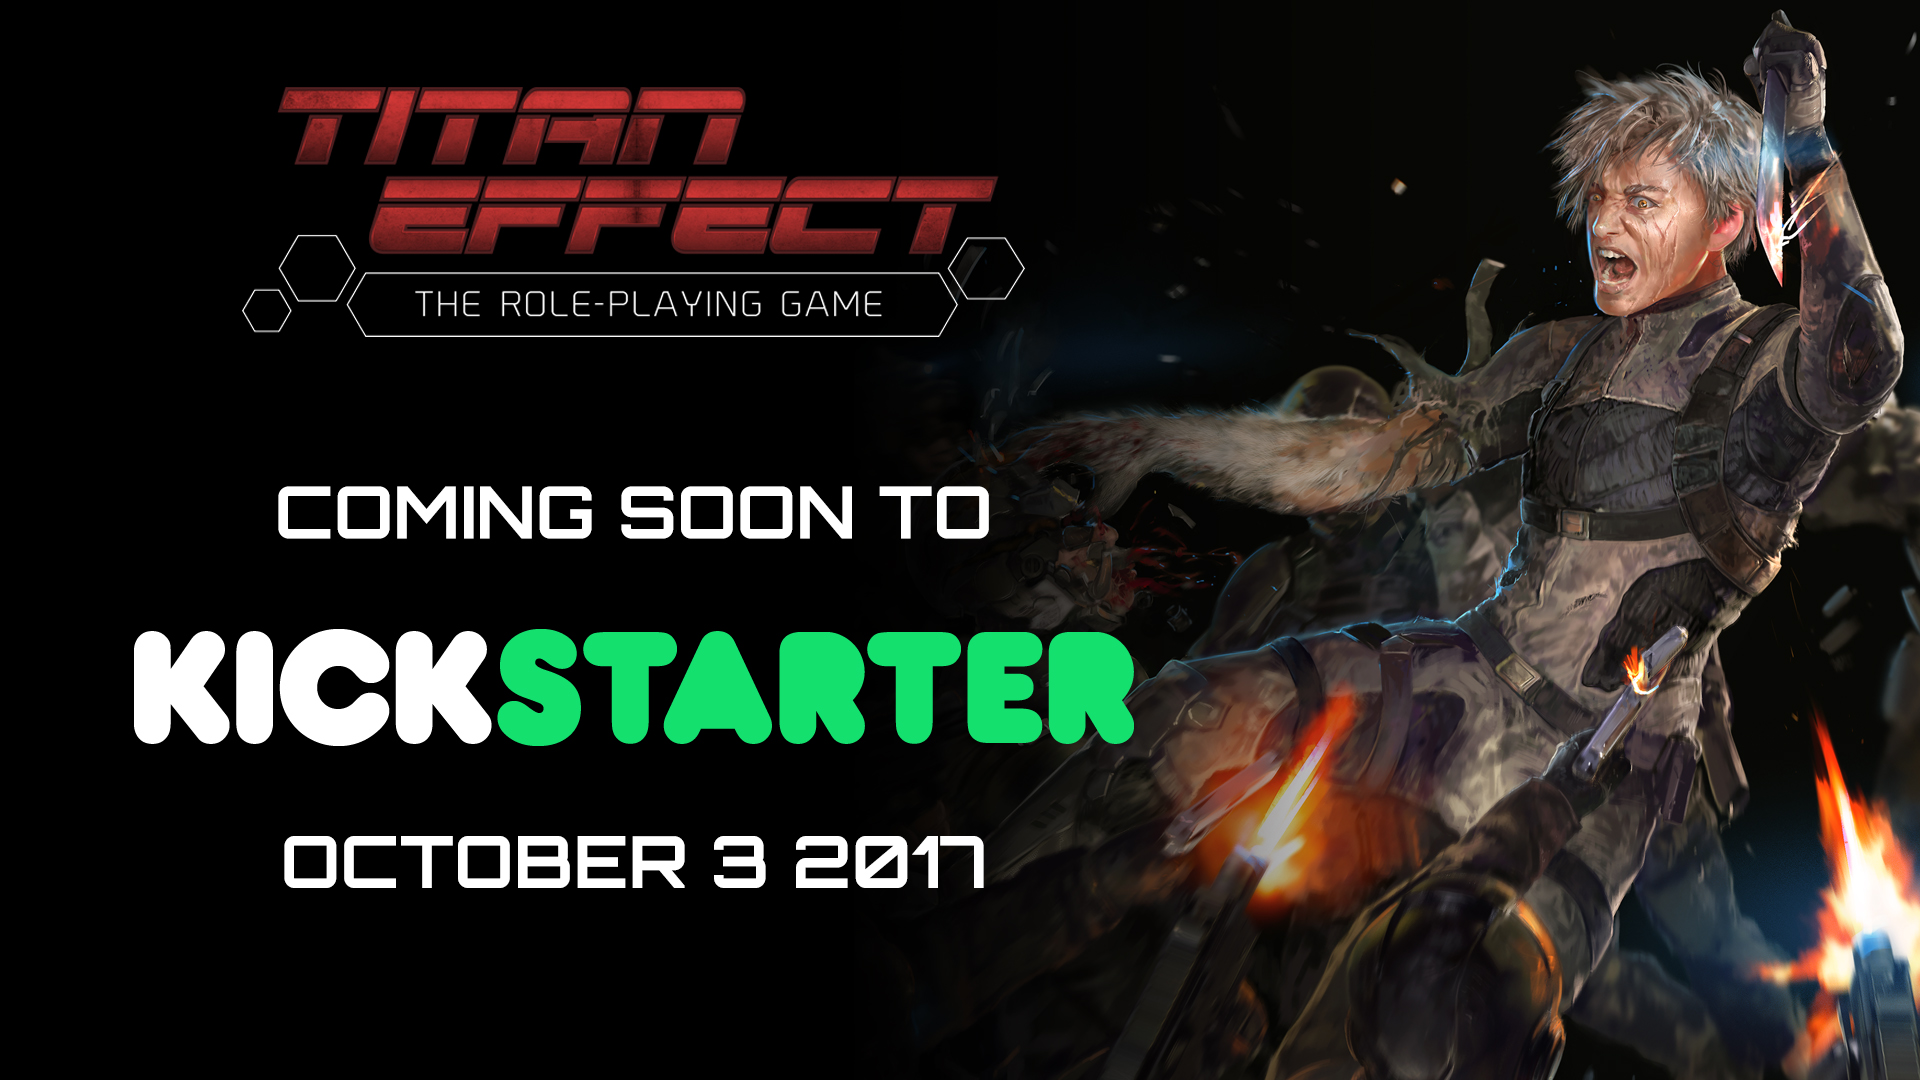 Titan Effect RPG coming soon to Kickstarter October 3 2017.